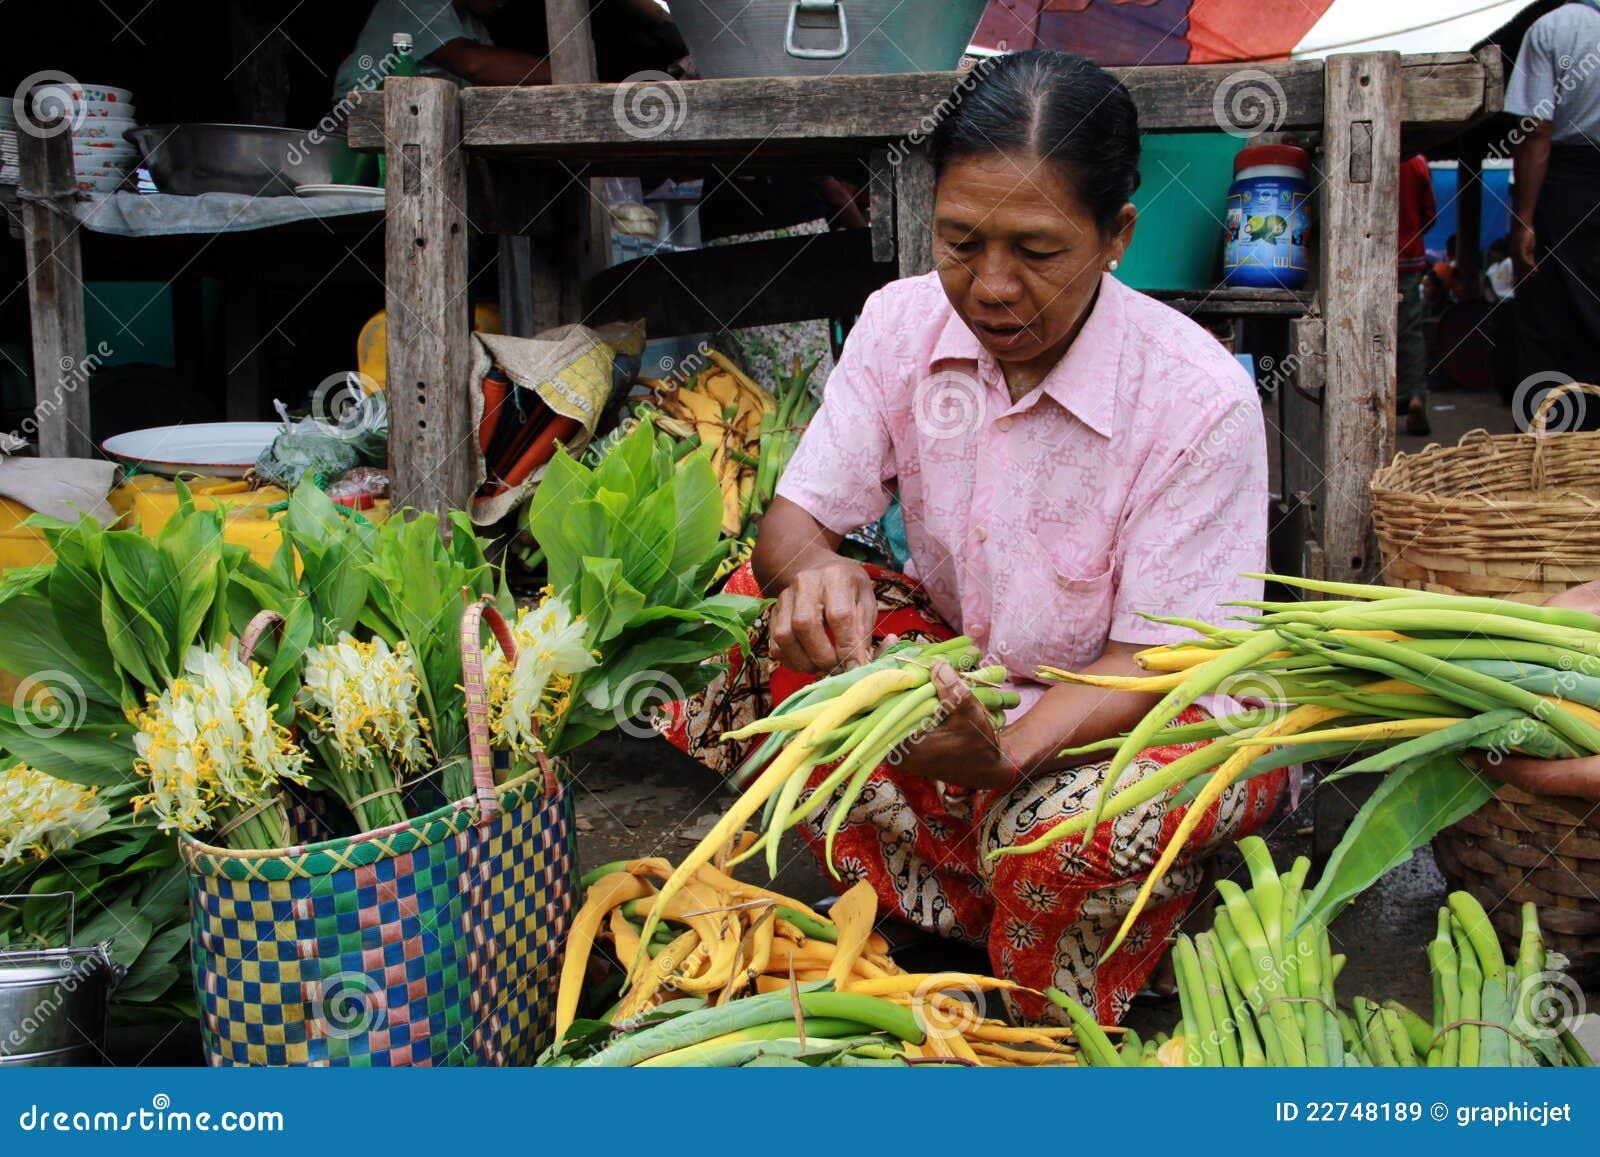 Old Myanmar Woman Selling Vegetables Editorial Stock Image